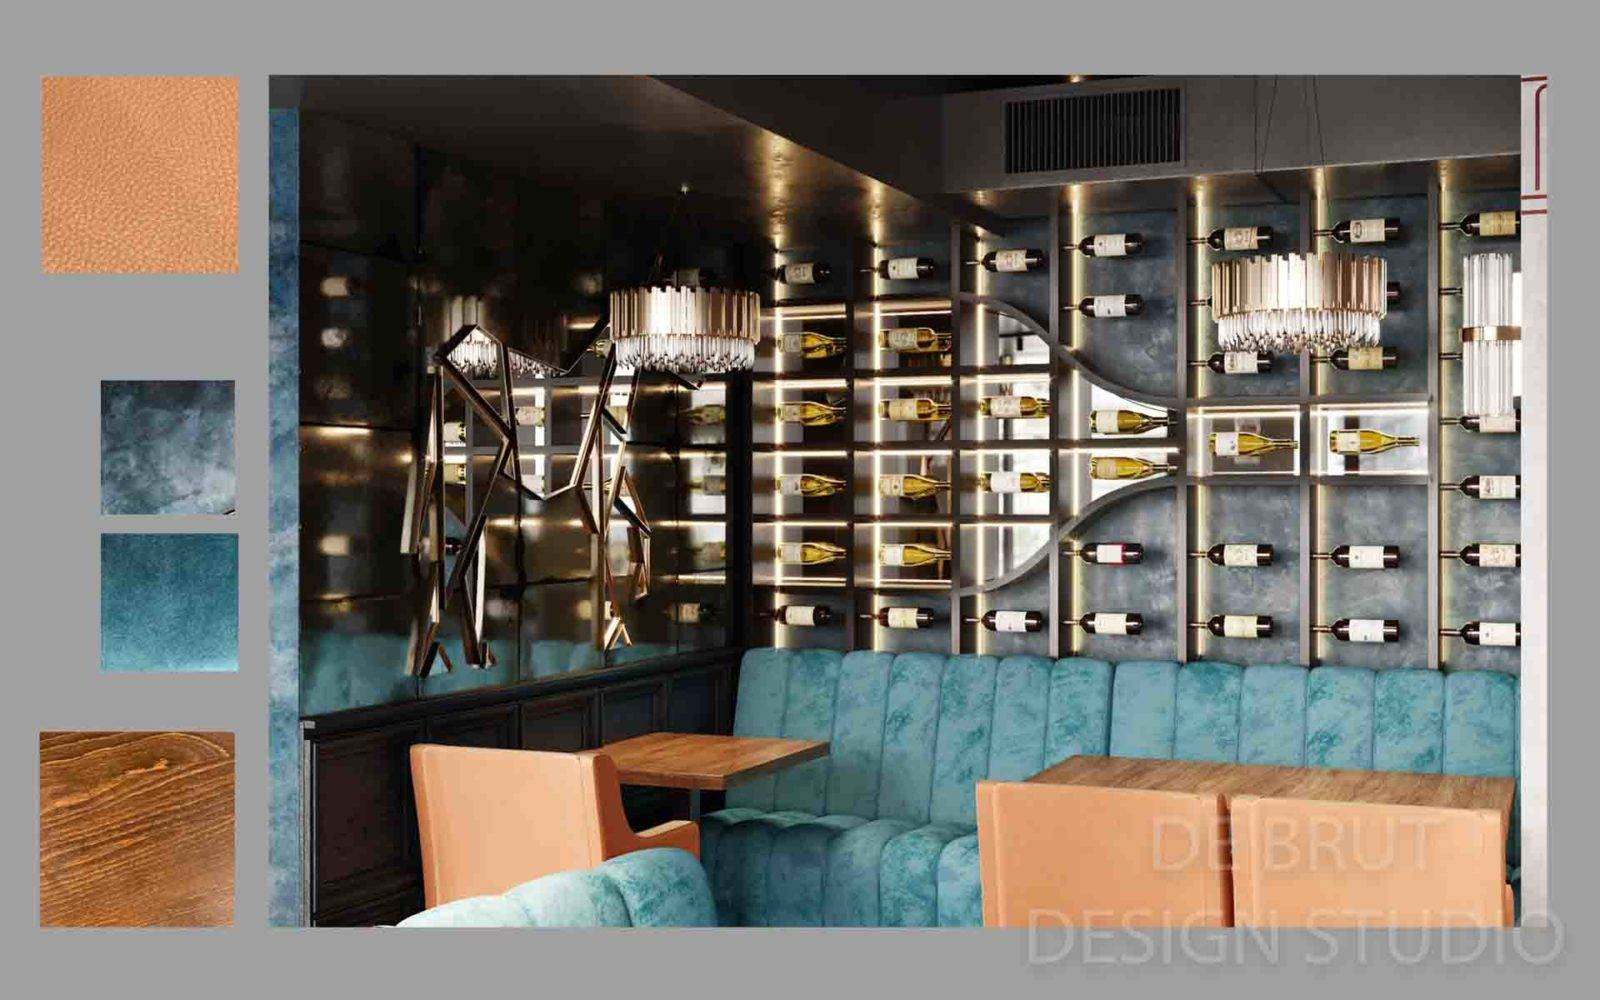 design interieru praha alex brut studio richman bussines bar 10 1 - Design interiéru restaurace Richman